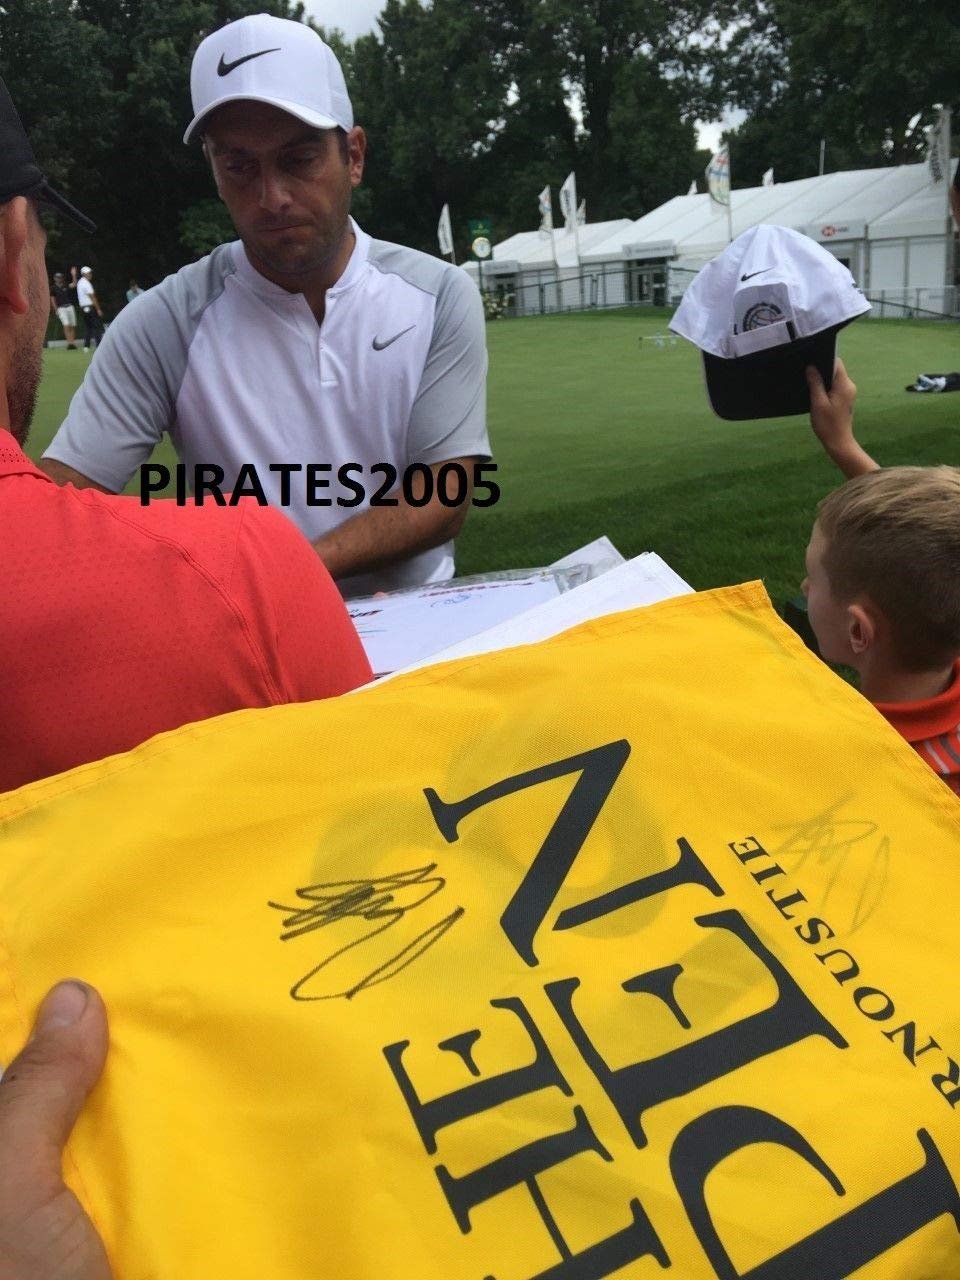 Francesco Molinari Autographed Signed 2018 British Open Flag Carnoustie Proof JSA Authentic